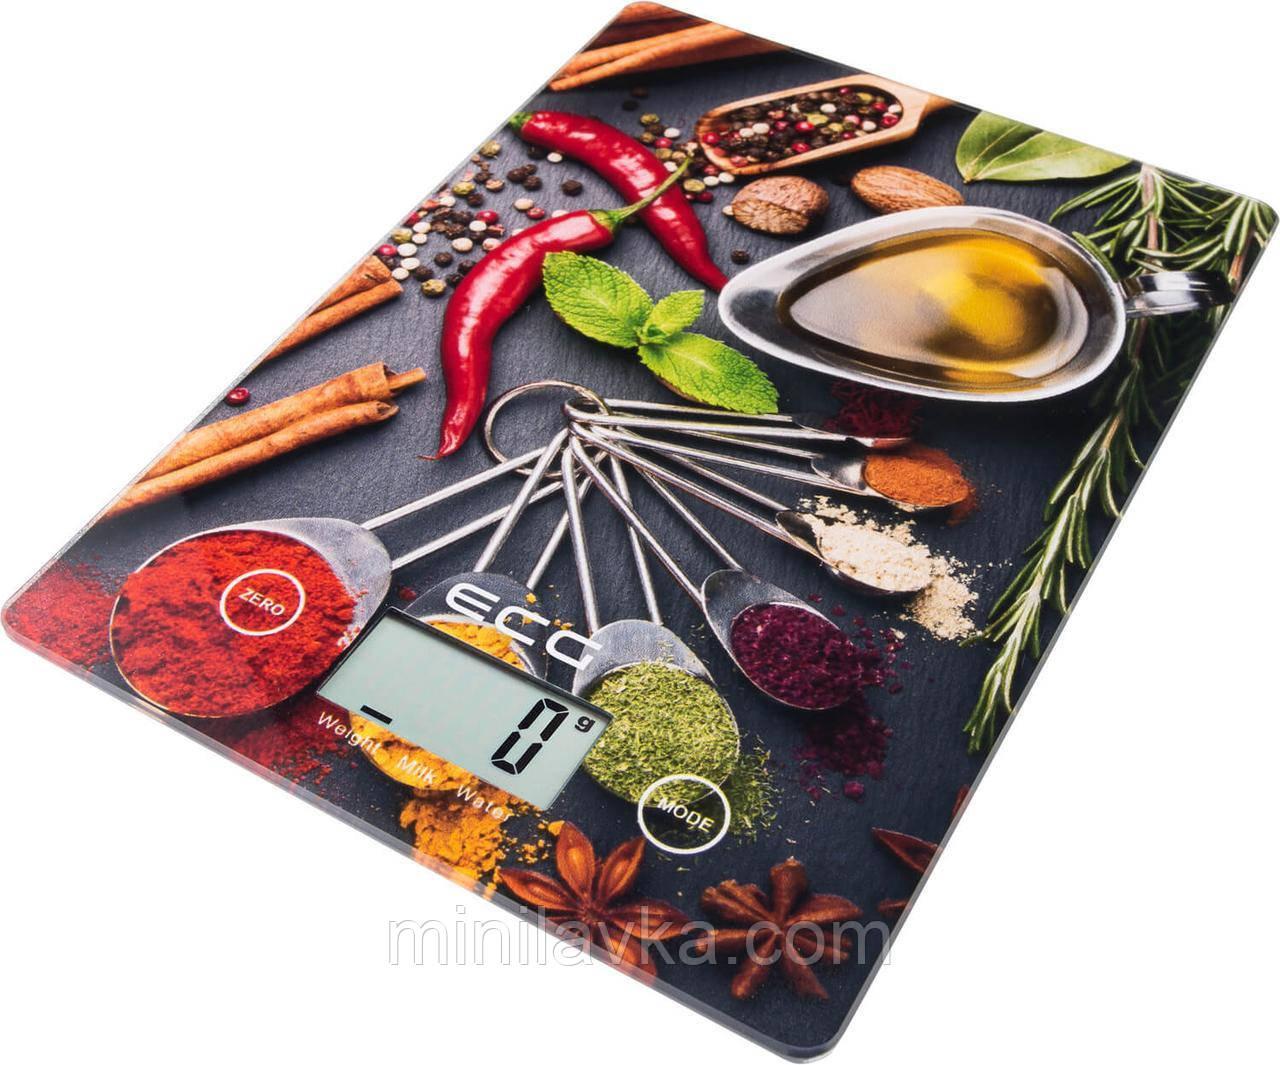 Весы кухонные ECG KV 117 SLIM chilli до 5 кг